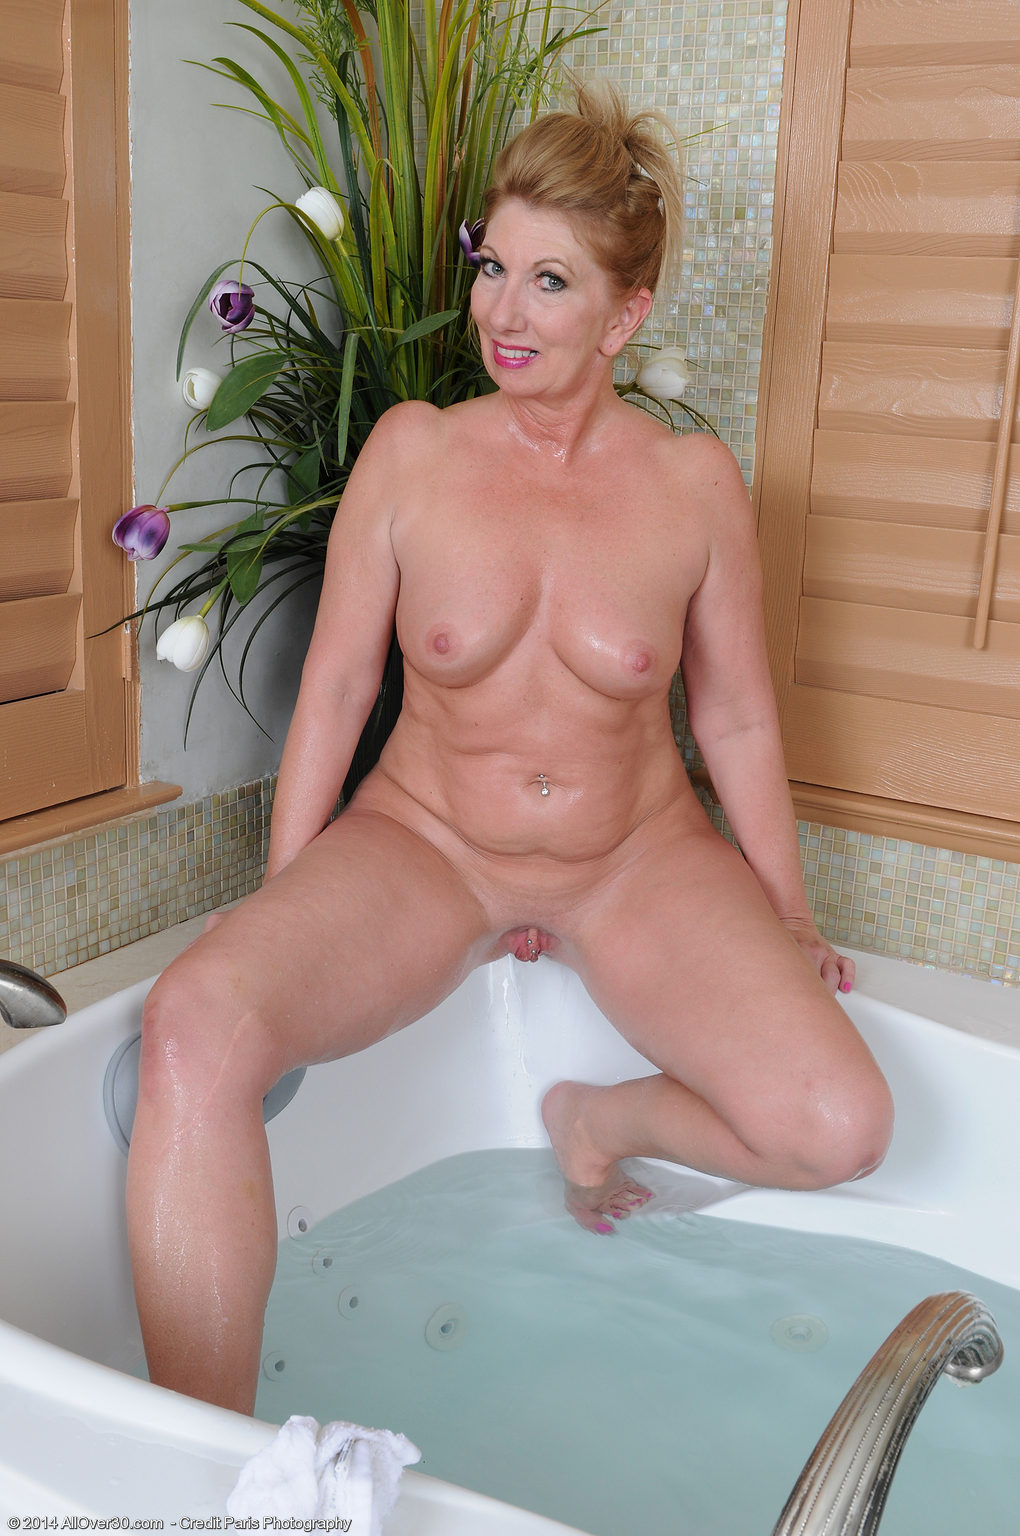 53 year old florida redhead 9